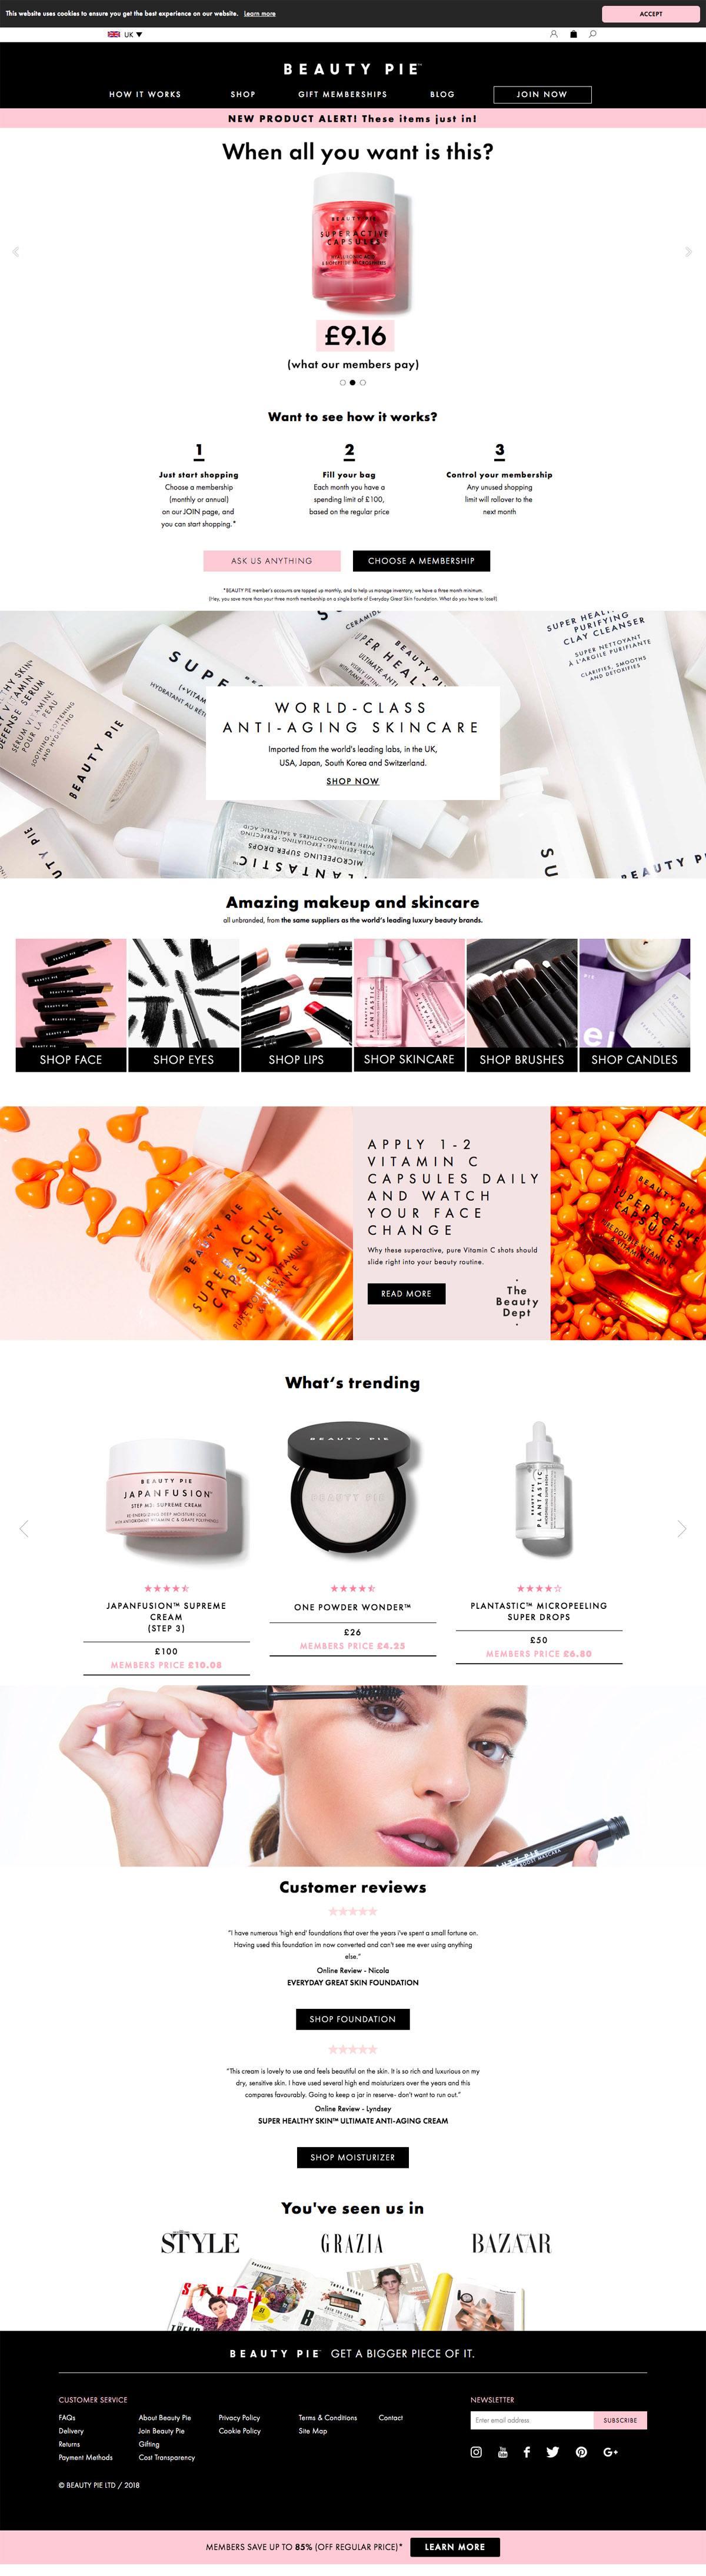 eCommerce website: Beauty Pie